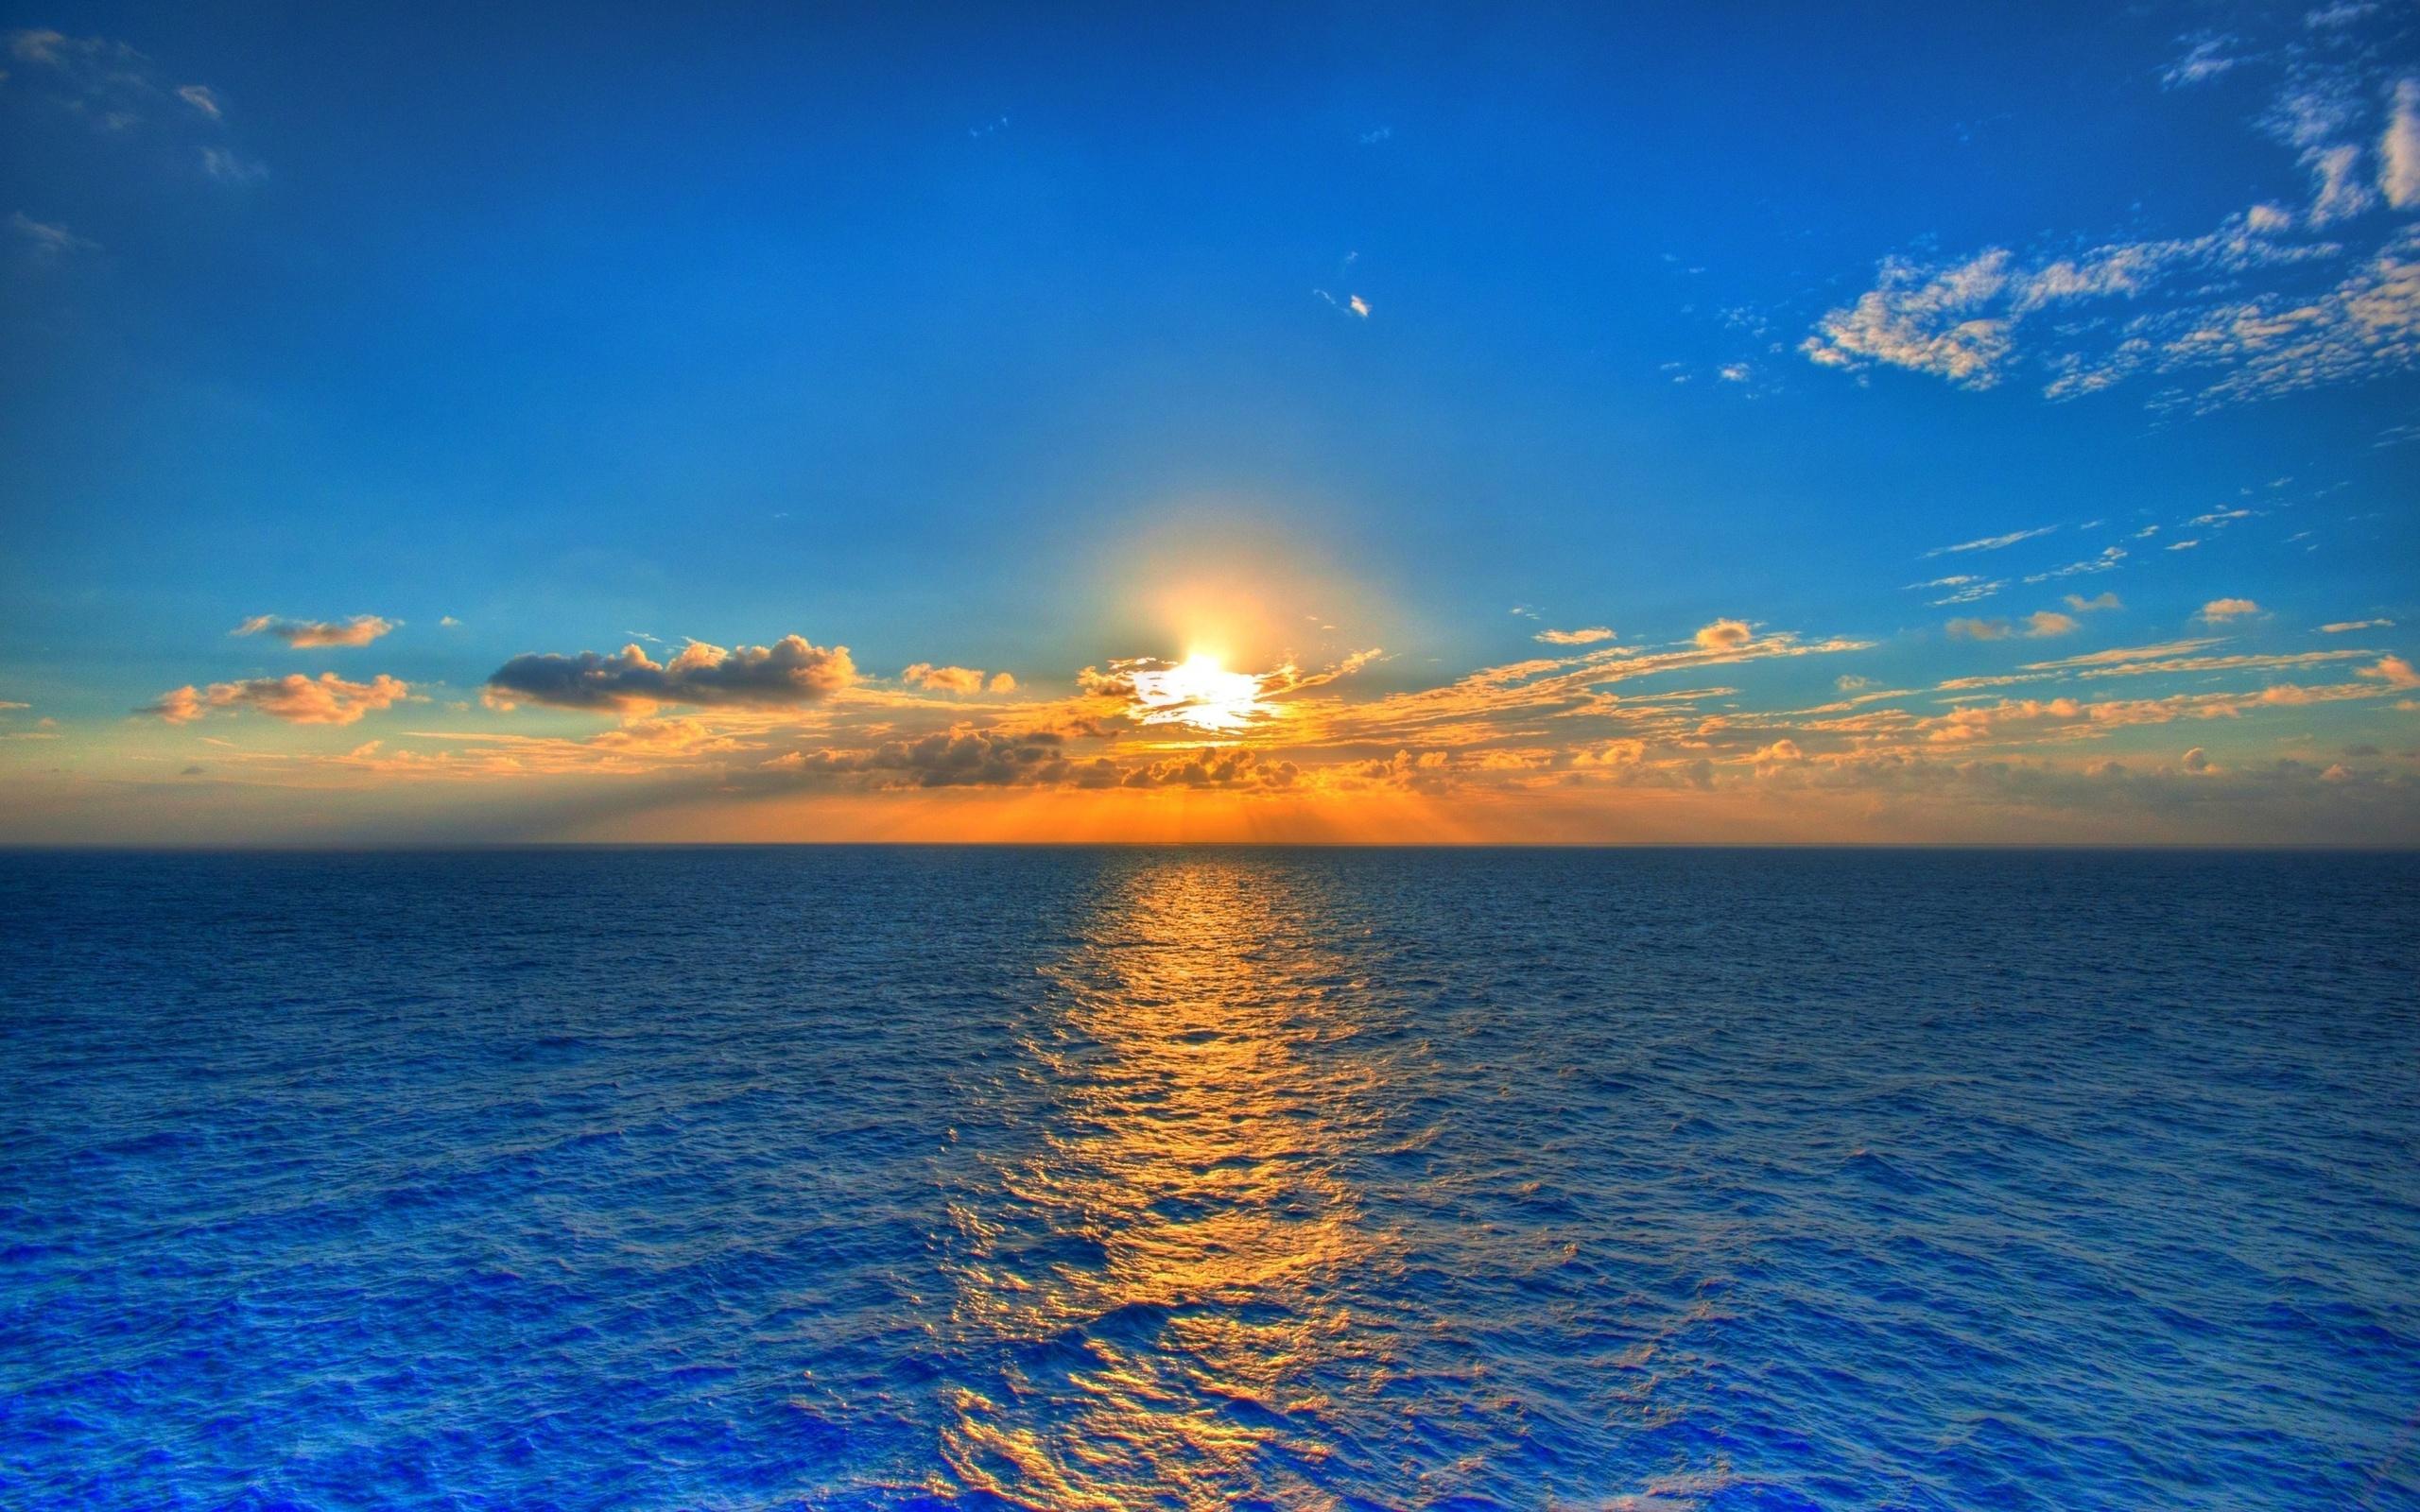 Sea Sunrise Sky Clouds Feed Wallpaper Hot Hd 2560x1600px